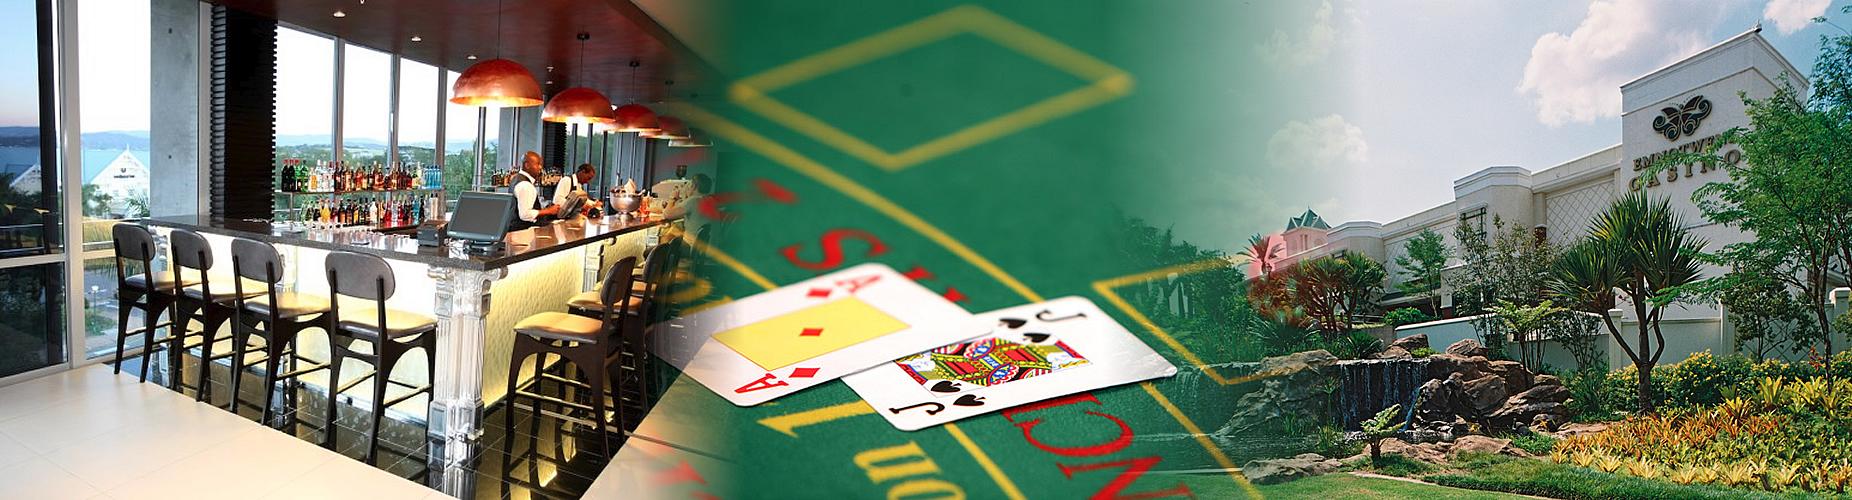 Huuuge casino free games